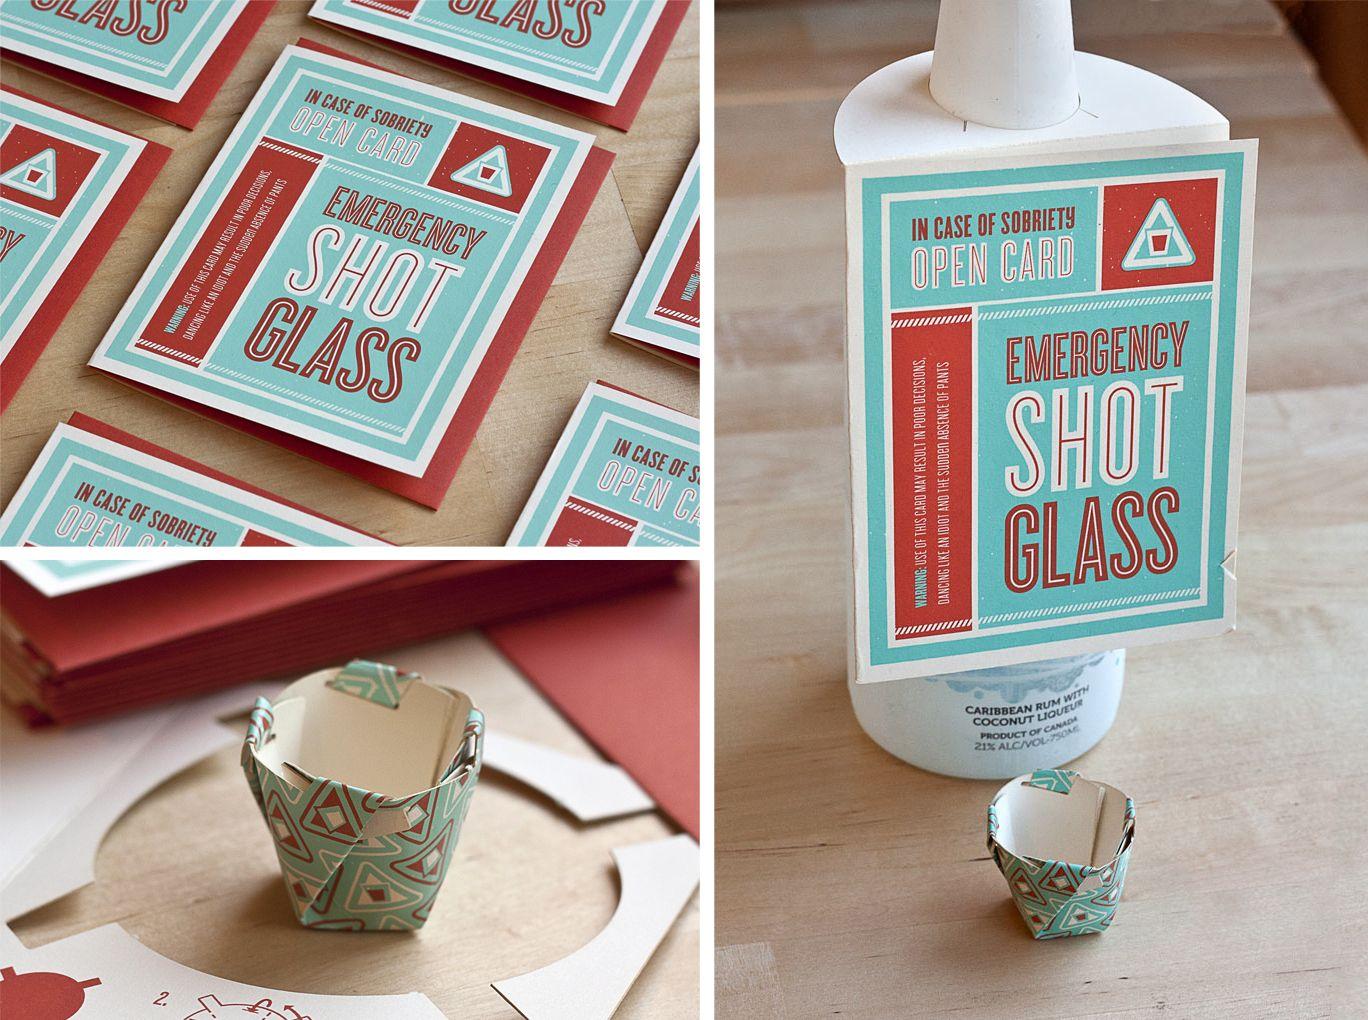 The Emergency Shot Glass Card |Fifty Five Hi's